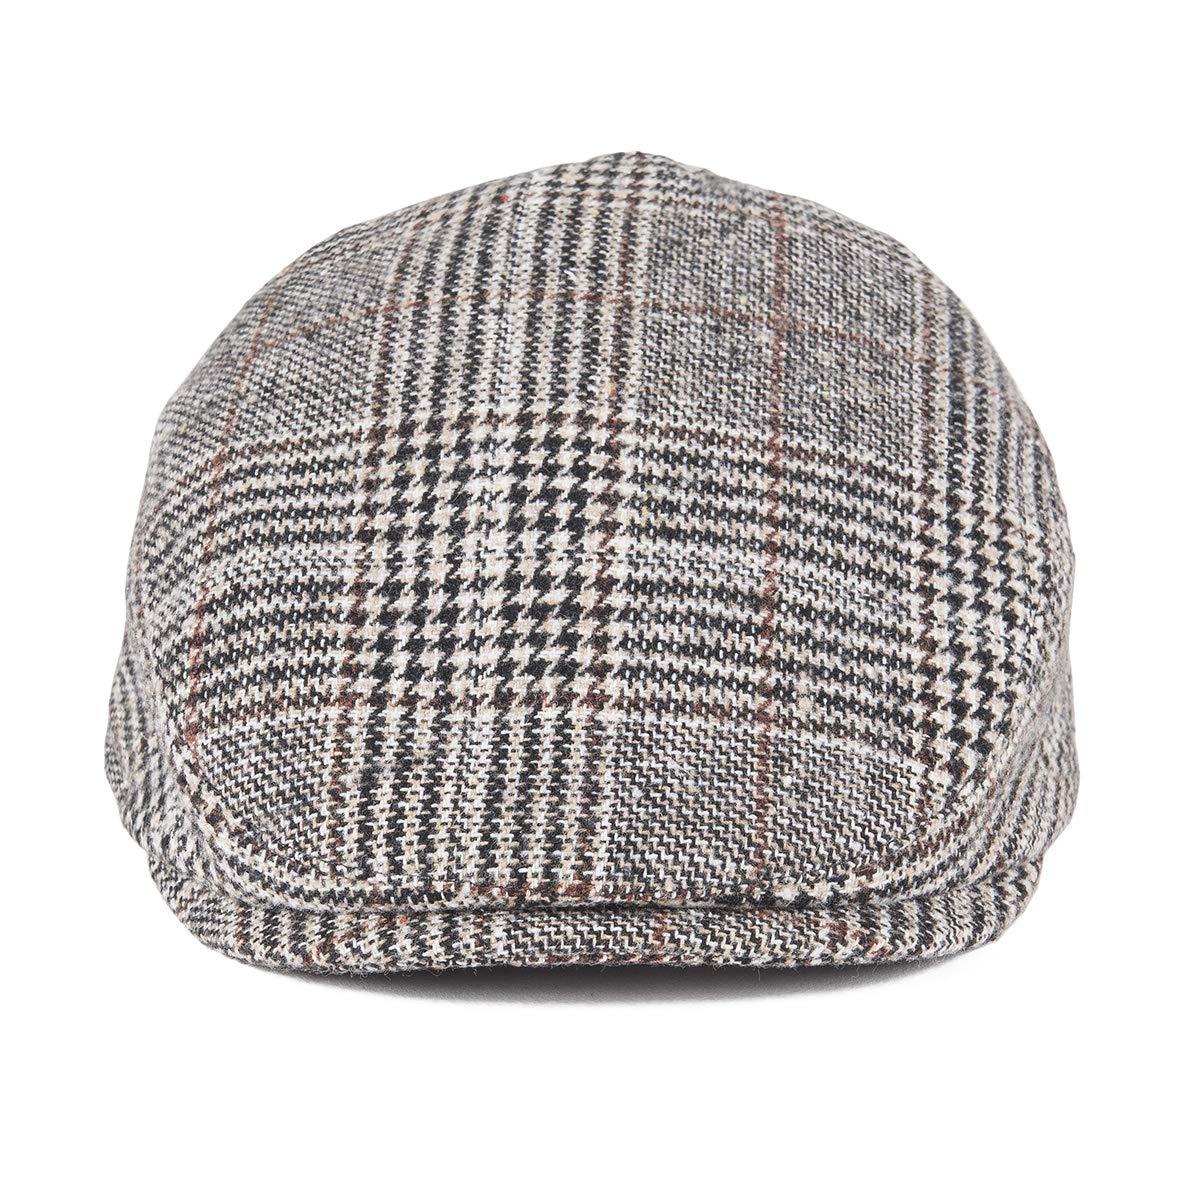 Amazon.com  JANGOUL Kids Wool Tweed Flat Cap Herringbone Boy Girl Newsboy Caps  Infant Toddler Child Youth Beret Hat Ivy Gatsby Cap  Clothing 7377b0432f55